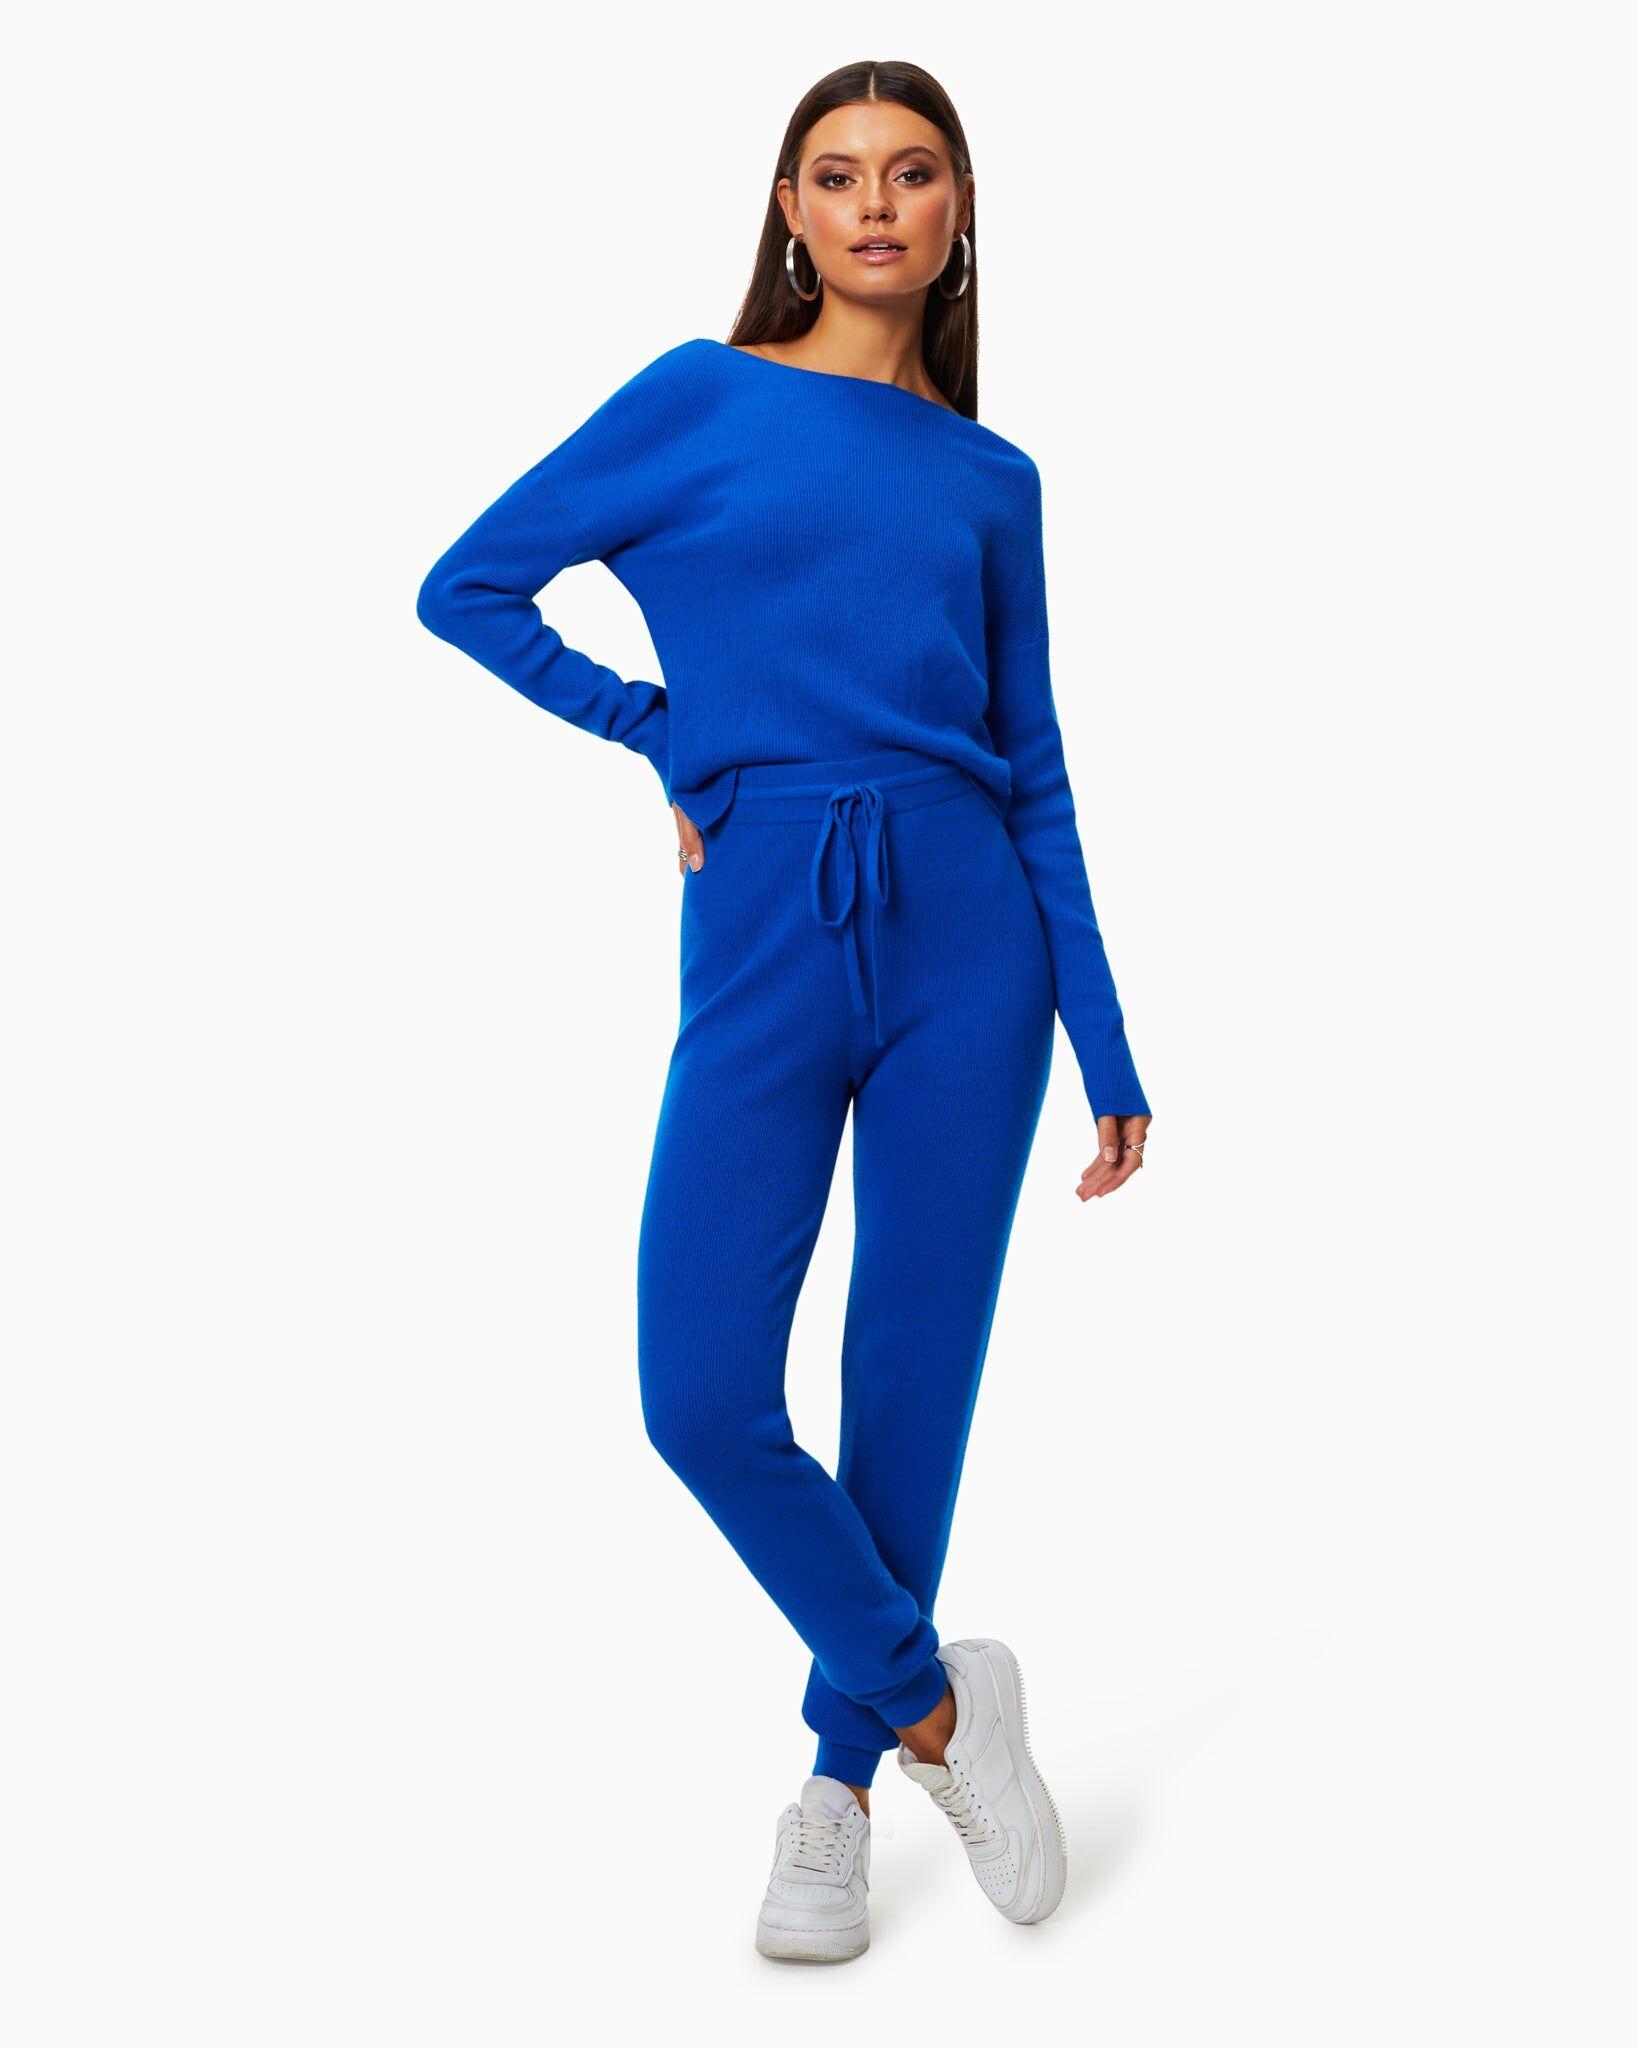 Landon Knit Jogger in Electric Blue - Electric Blue - Size: XS